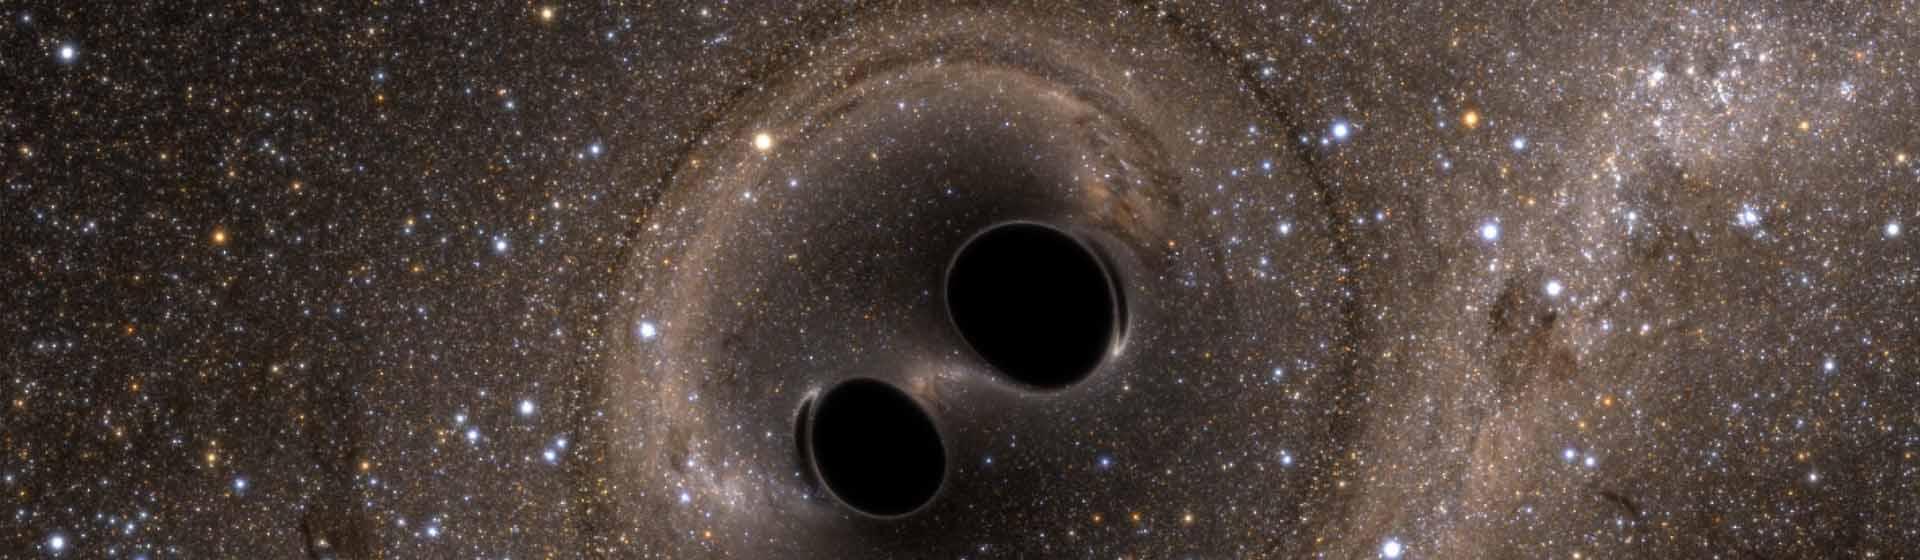 onde gravitazionali nobel planetario milano